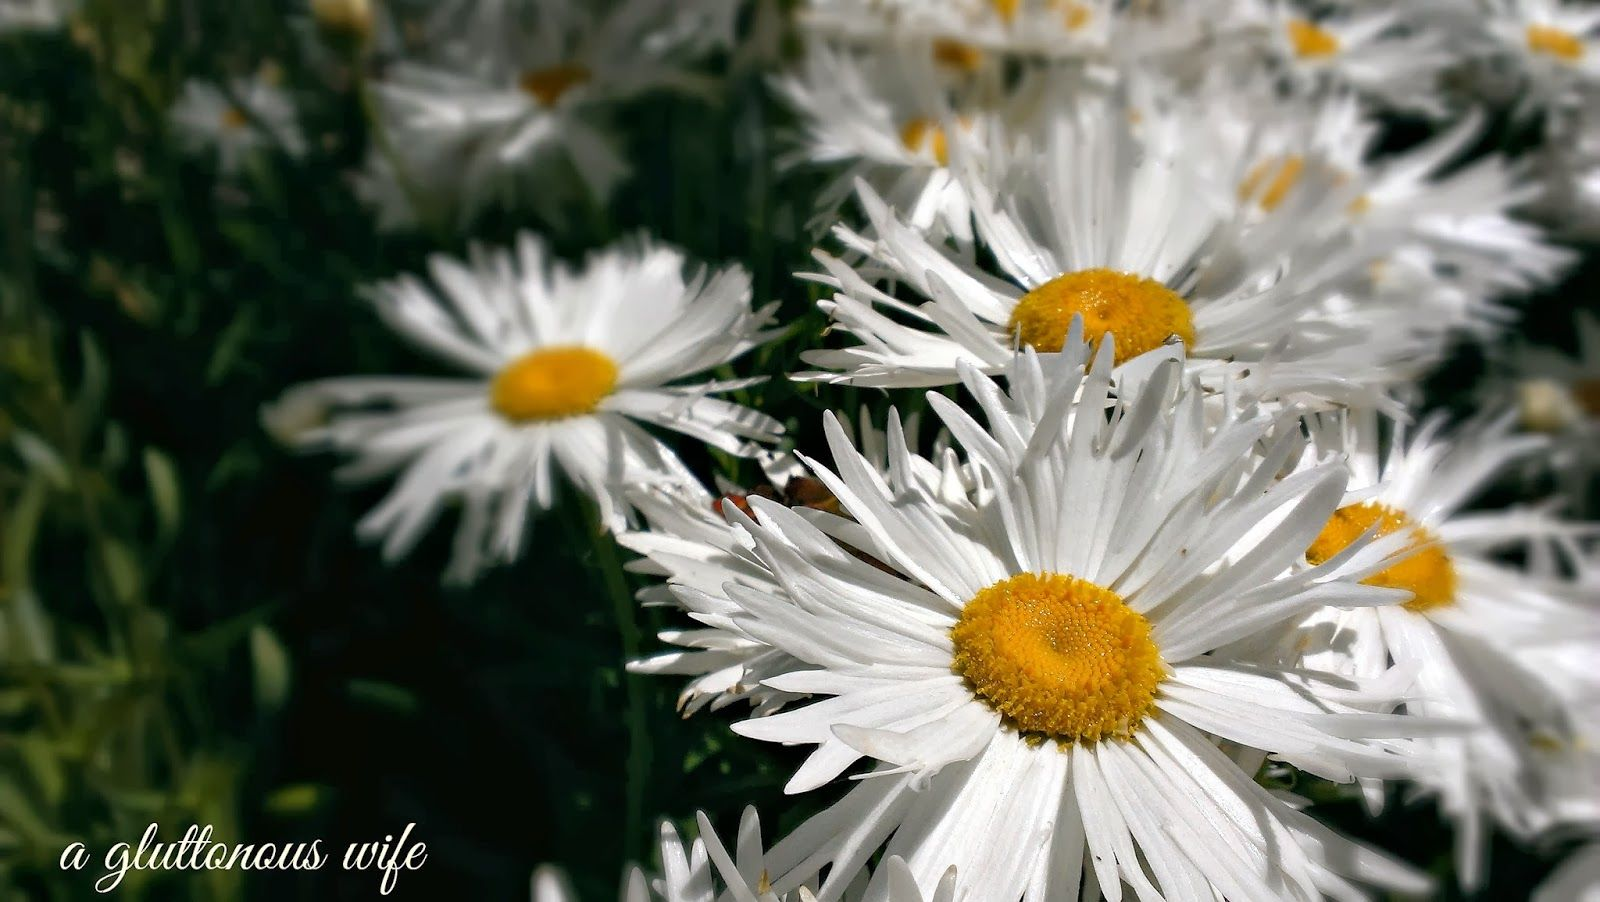 daisy, daisies